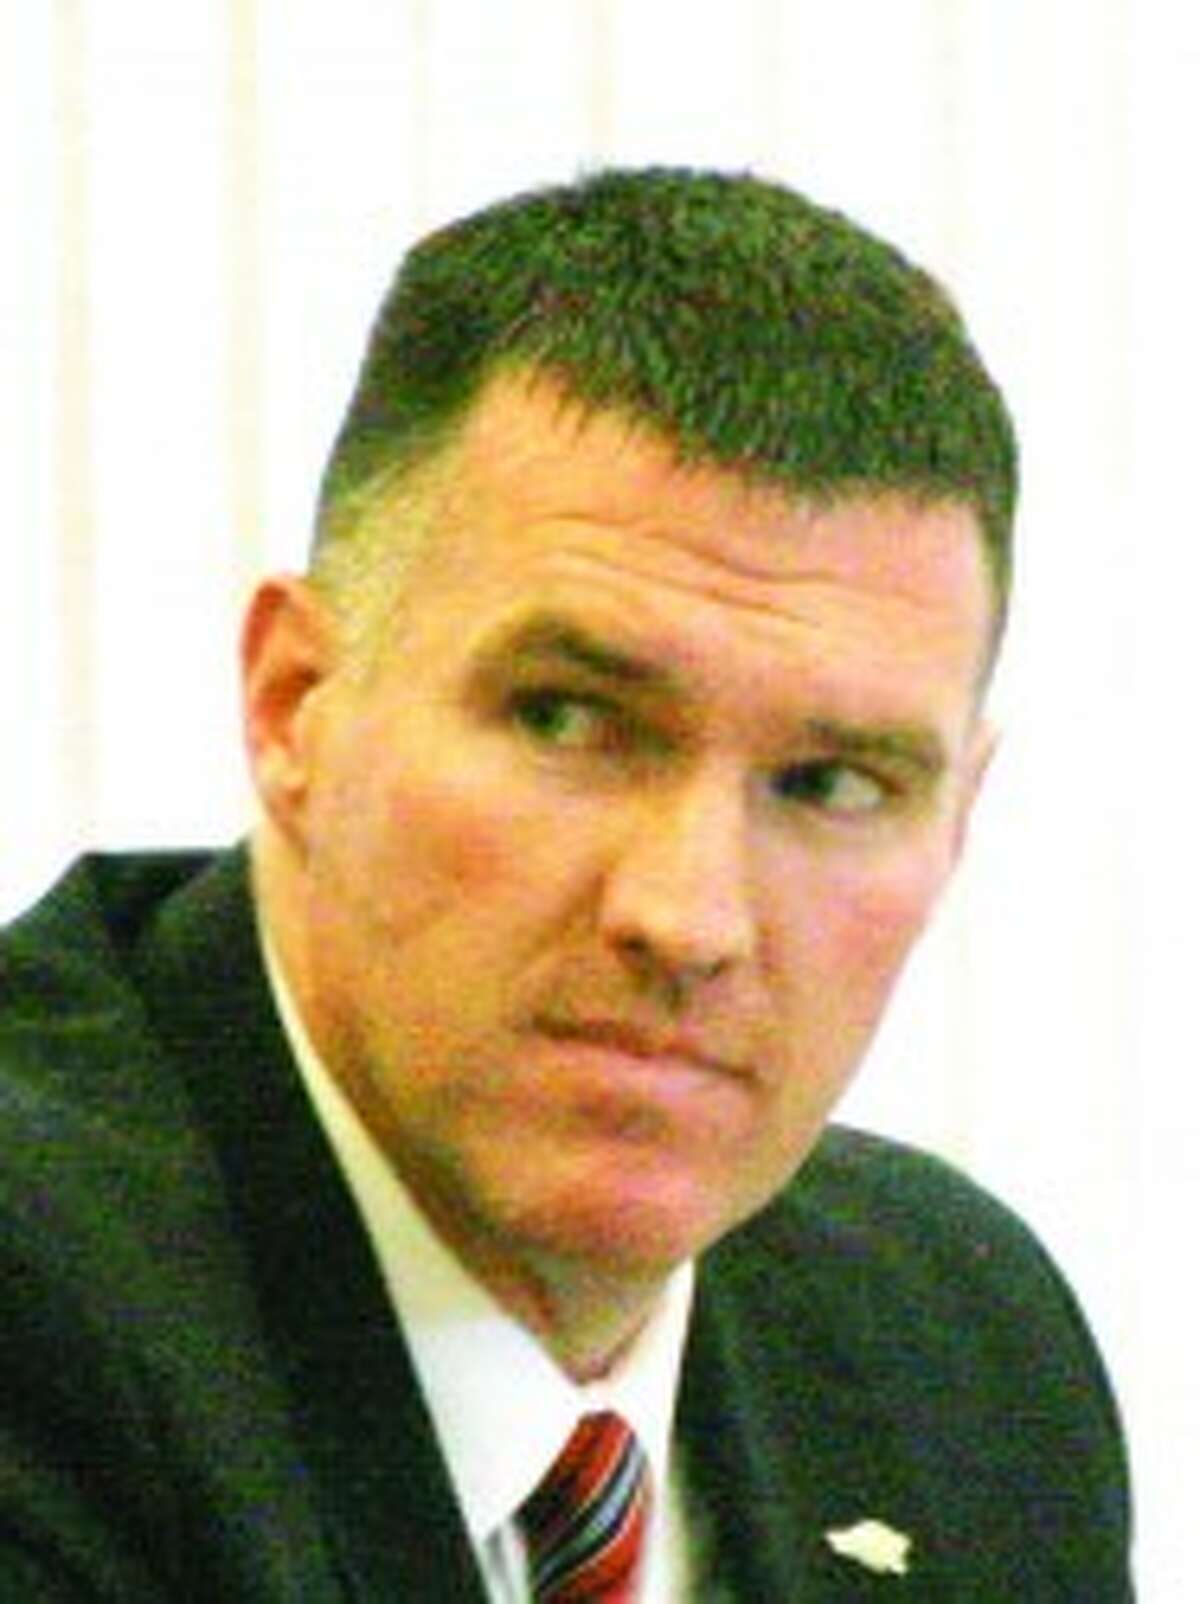 BRPS Superintendent Tim Haist